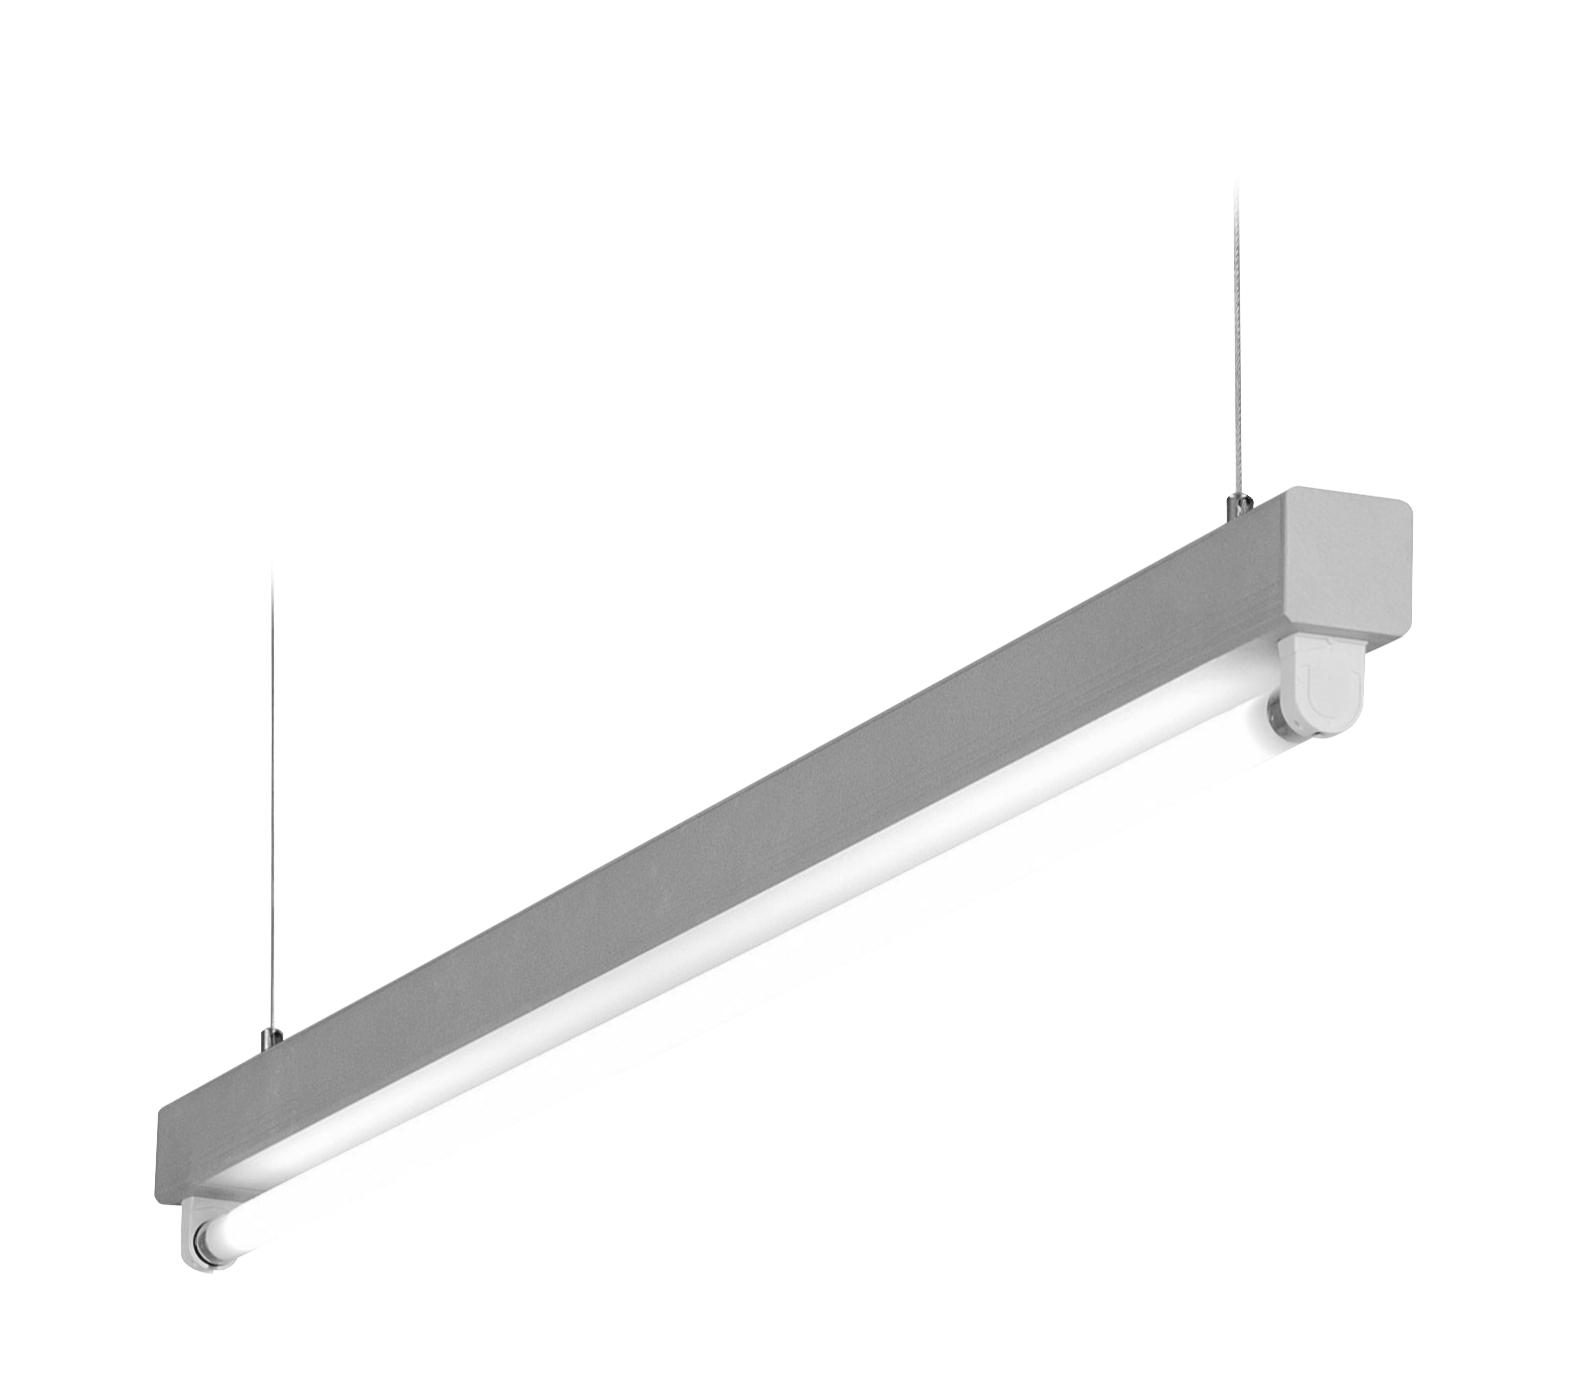 1 Stk Lucie T5 1x28/54W Aluminium Lichtleiste, QTI EVG LI38LUC154